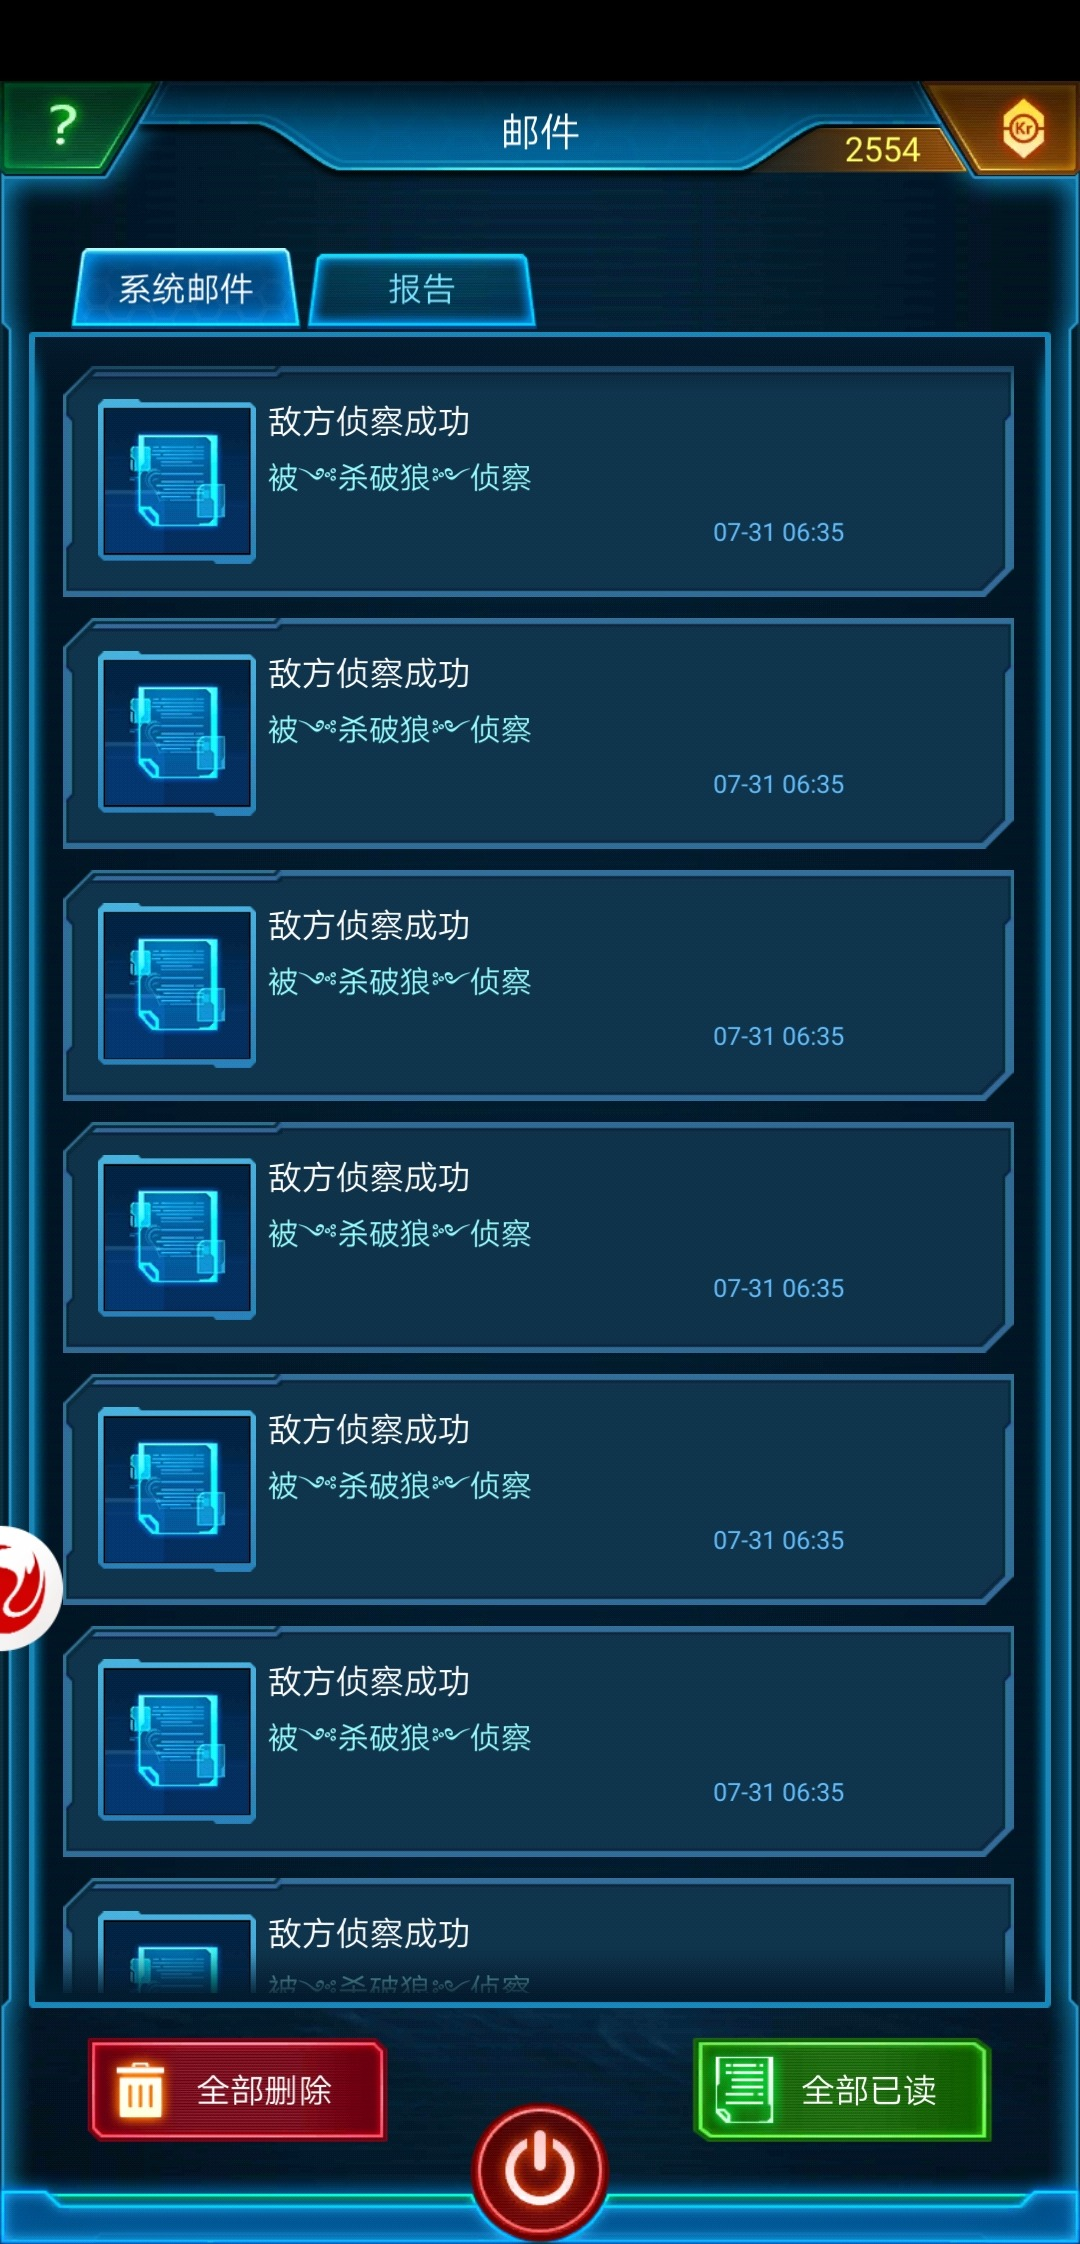 Screenshot_20190731_074802_com.jedigames.p16s.luobo.jpg